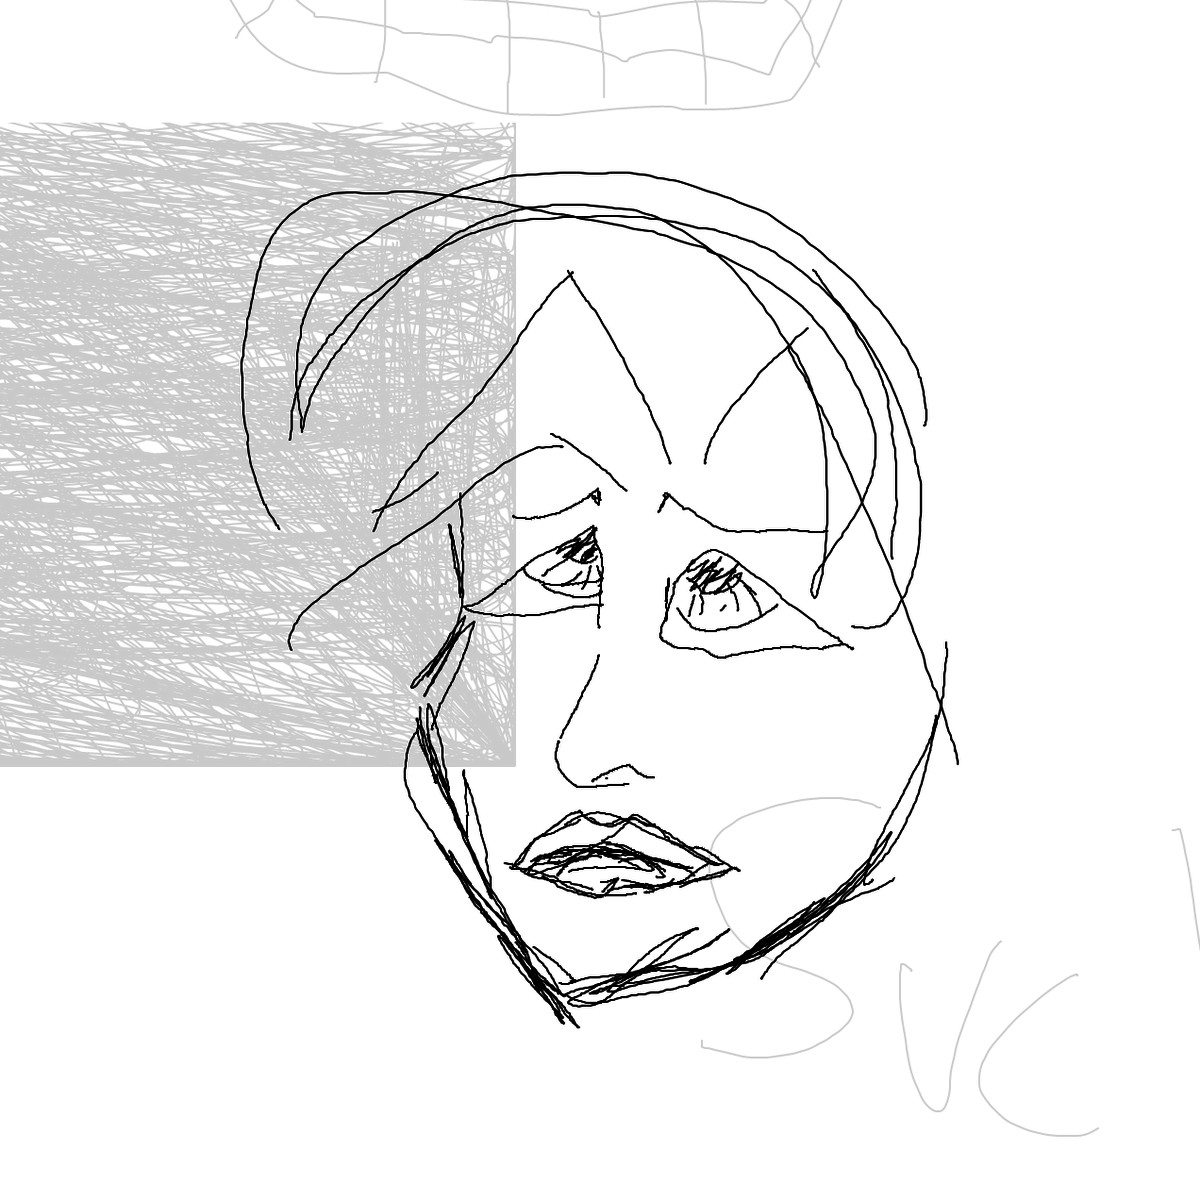 BAAAM drawing#23392 lat:51.5003356933593750lng: -0.1238011717796326